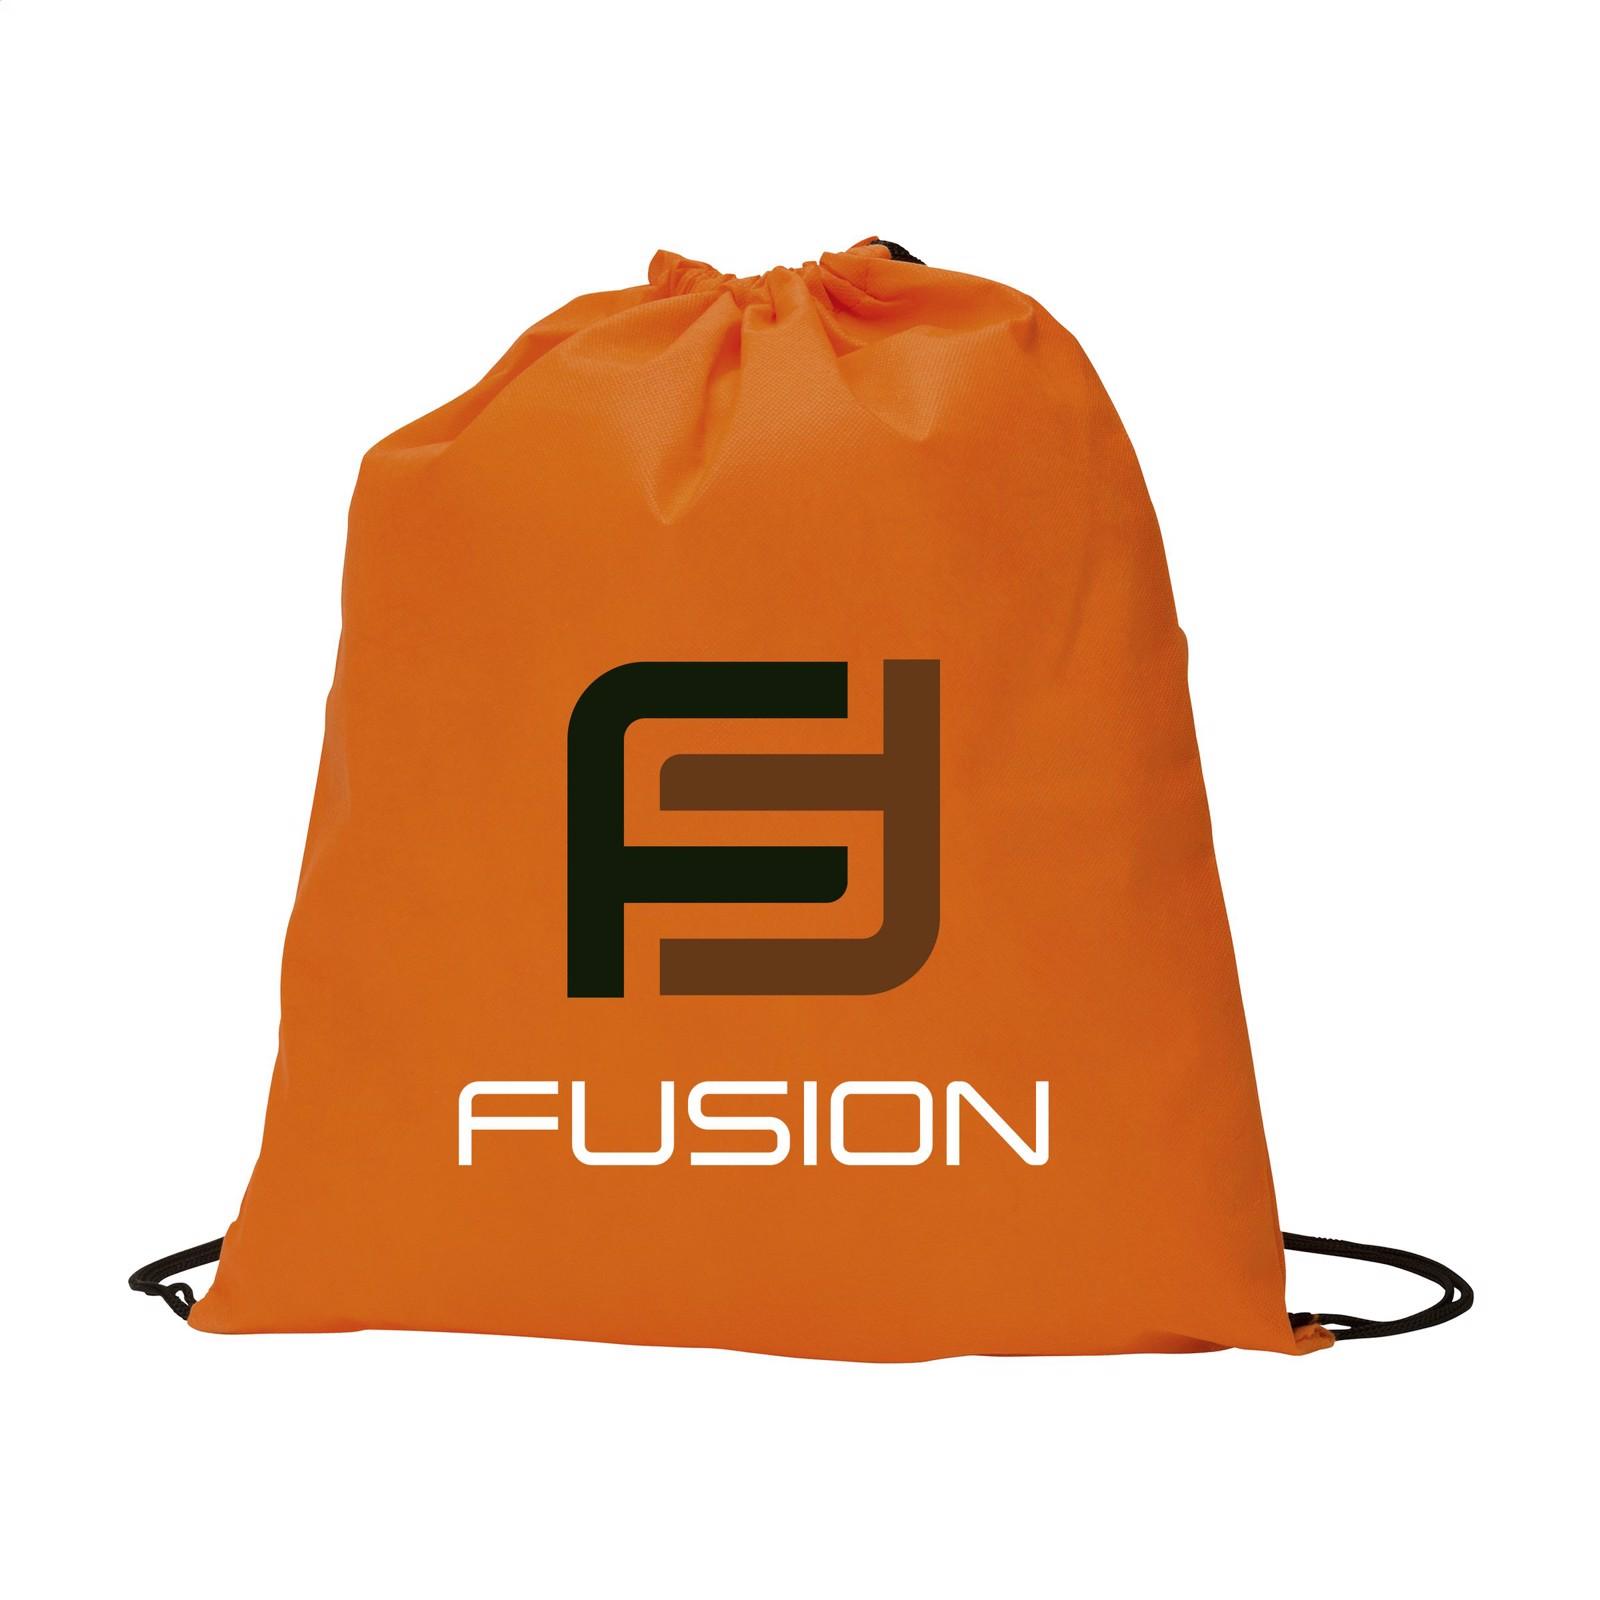 Non-Woven PromoBag backpack - Orange